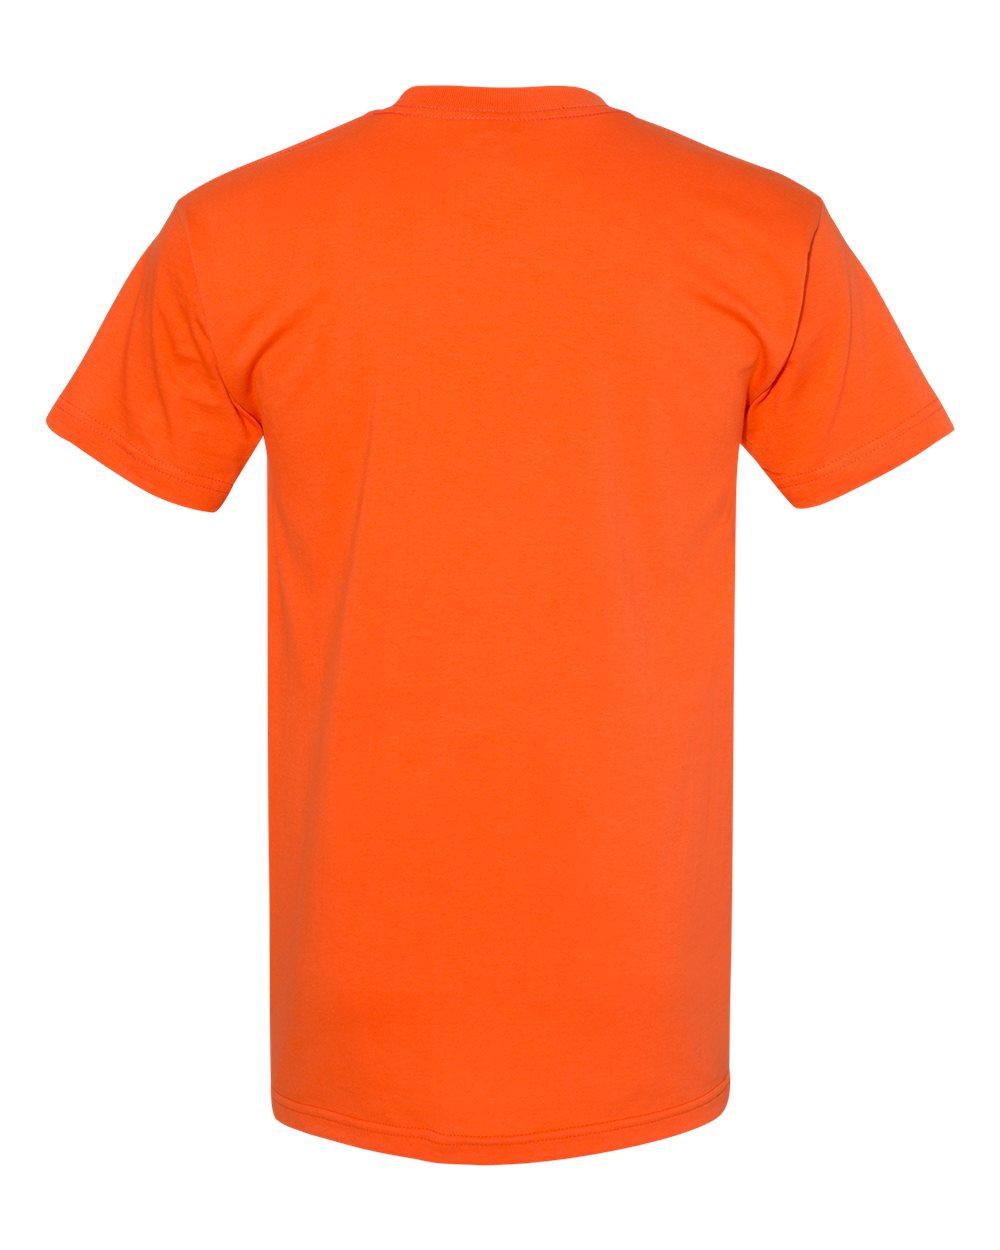 Bayside-Mens-Cotton-Blank-USA-Made-Short-Sleeve-T-Shirt-5100-up-to-5XL thumbnail 31